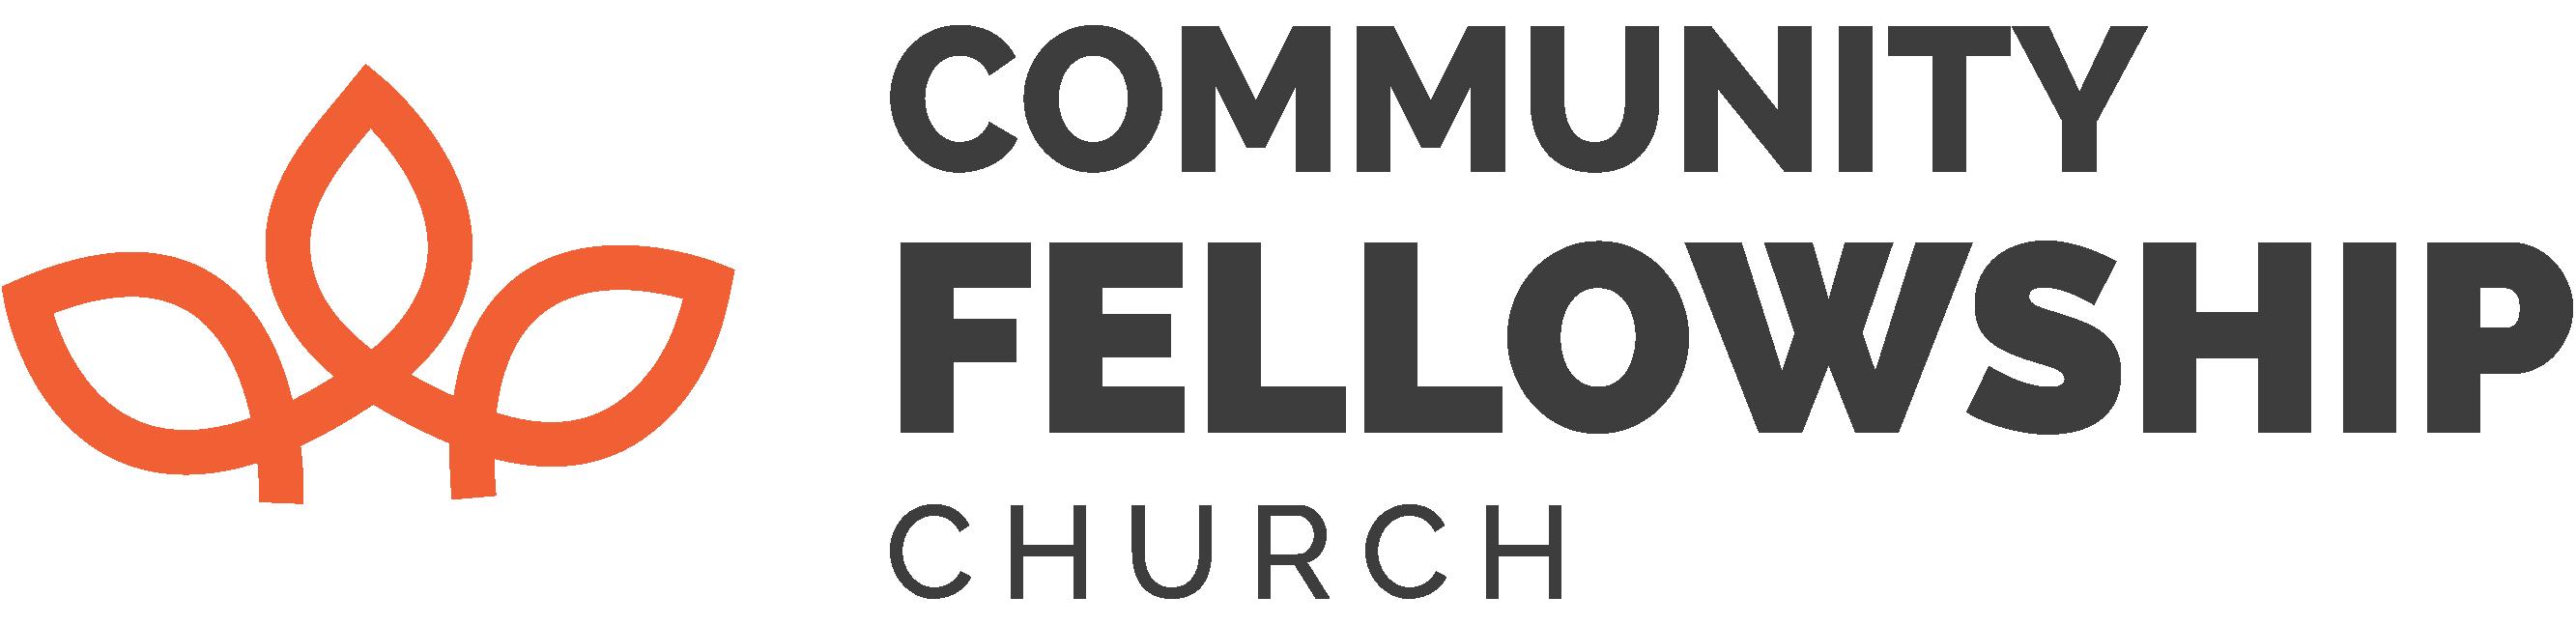 Community Fellowship Church